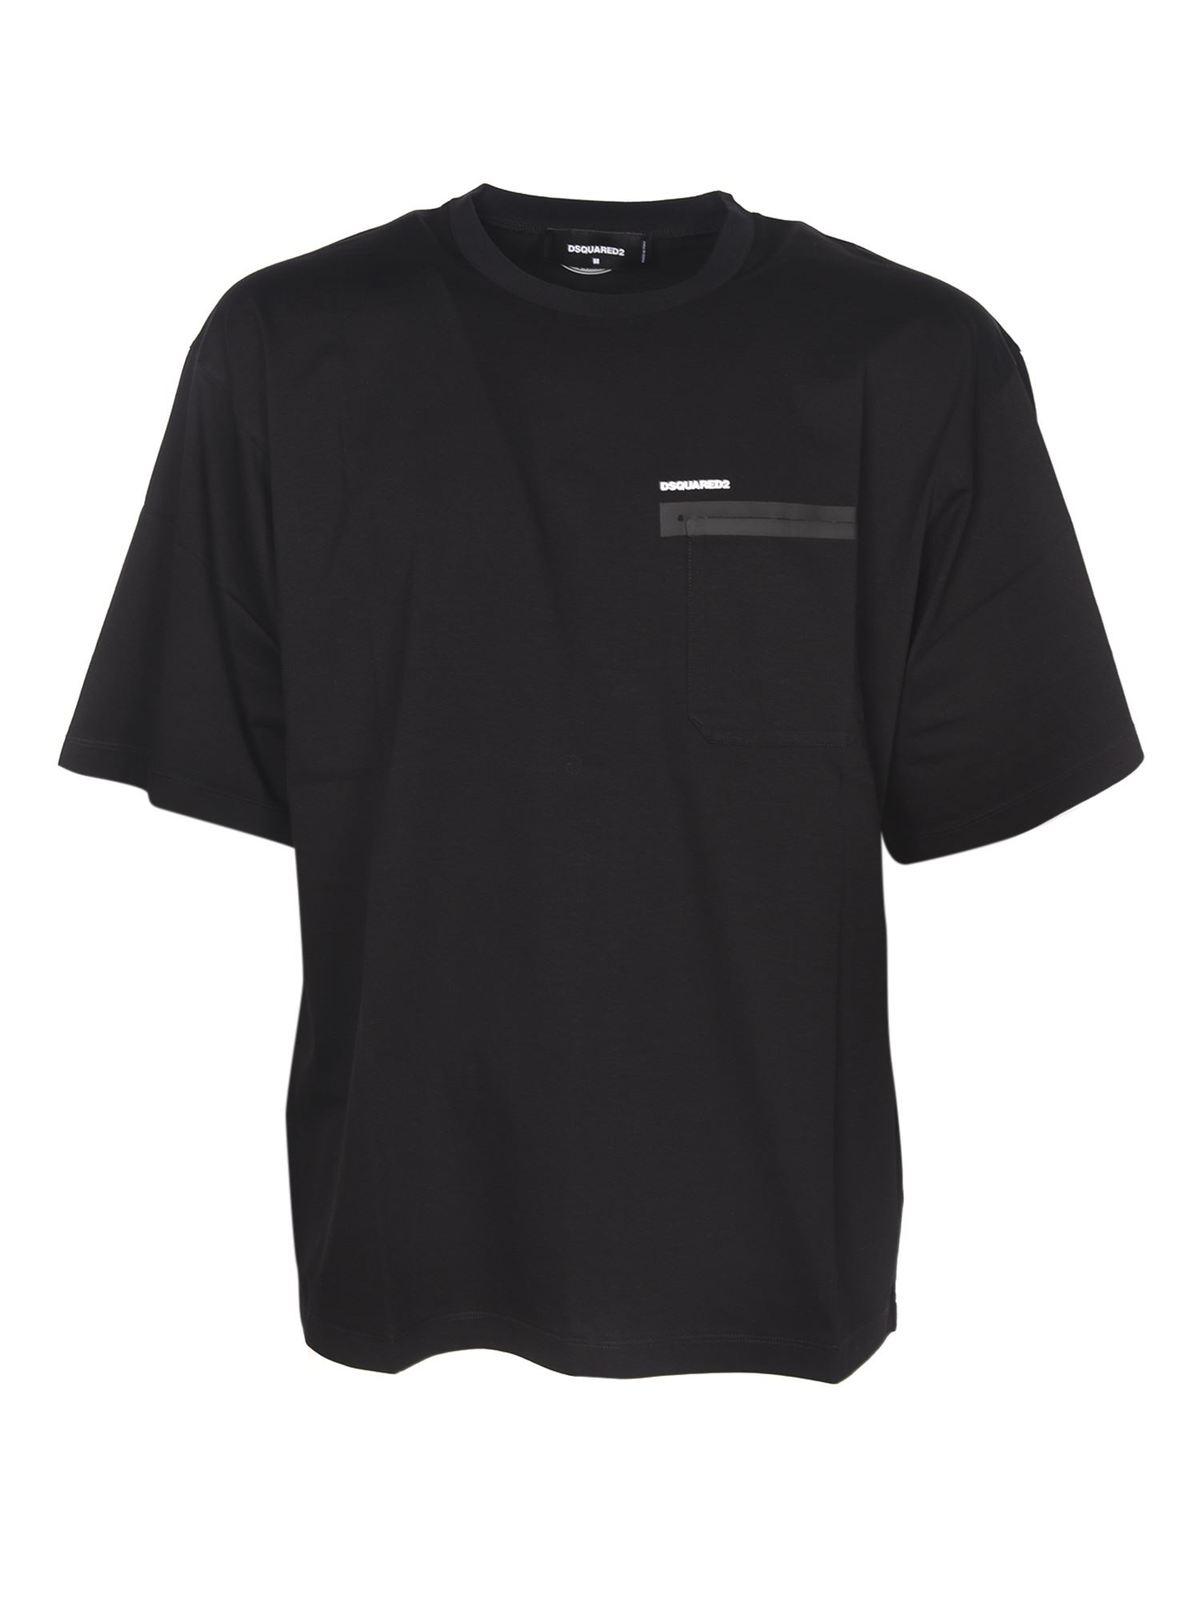 Dsquared2 Cottons POCKET LOGO T-SHIRT IN BLACK